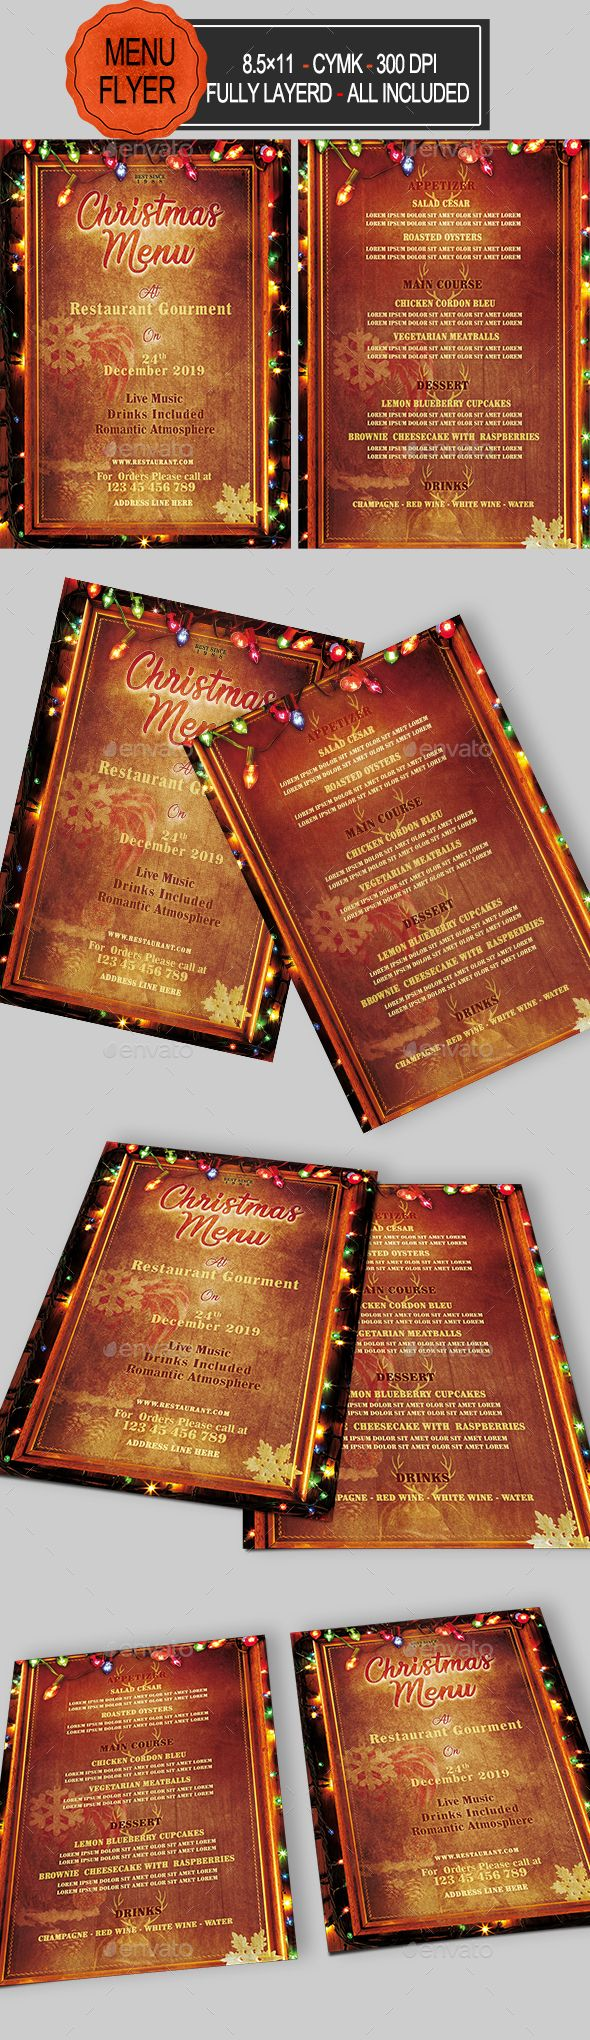 editable menus